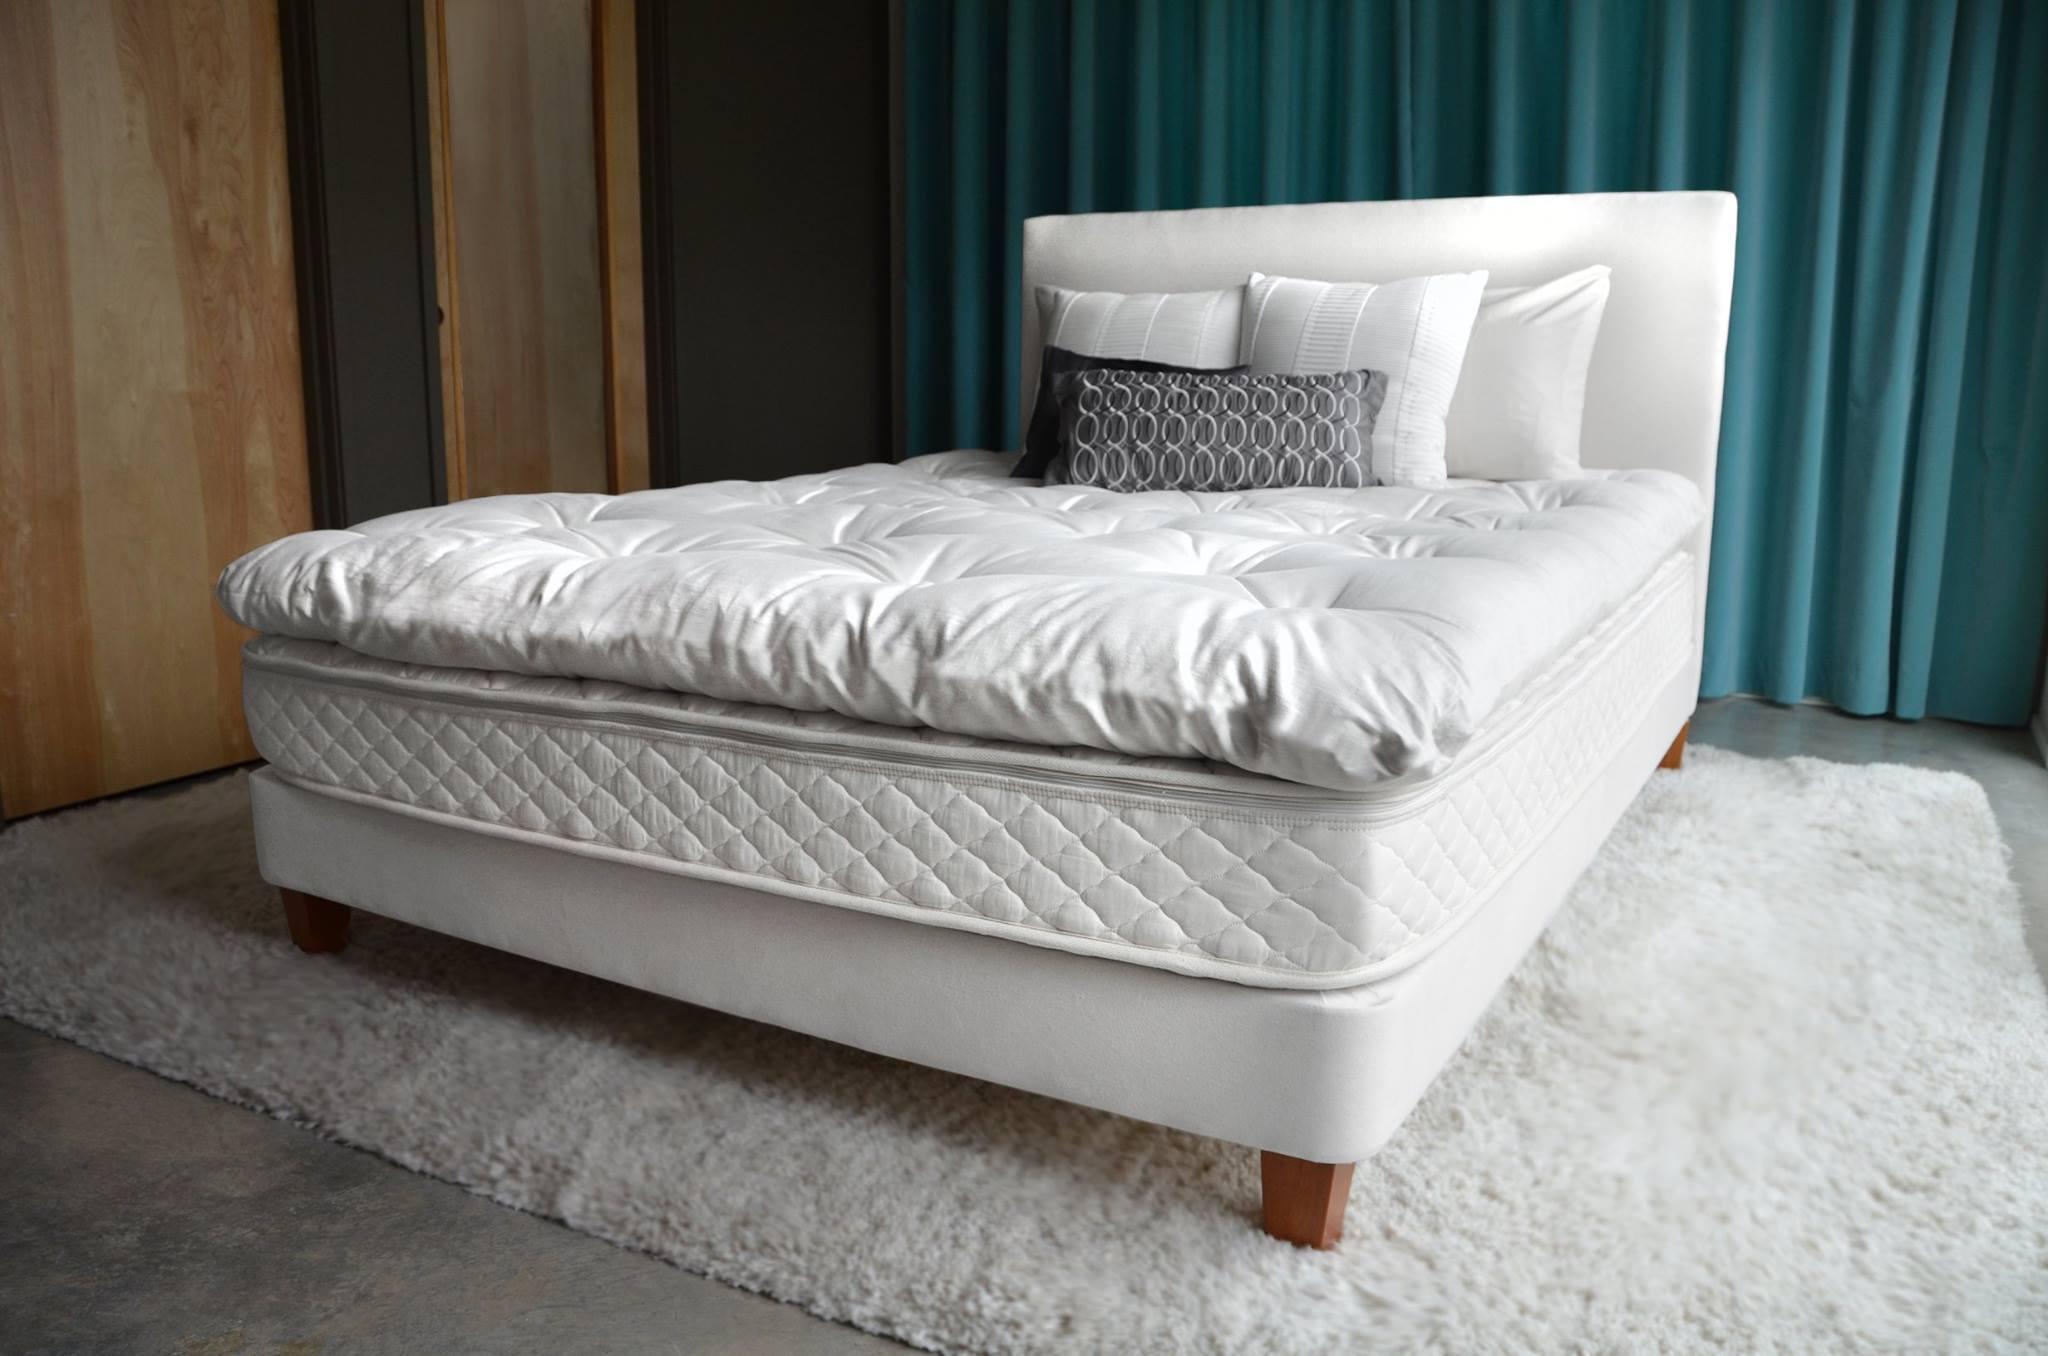 home images beautiful of rv some design matters foam inside life mattress jack add